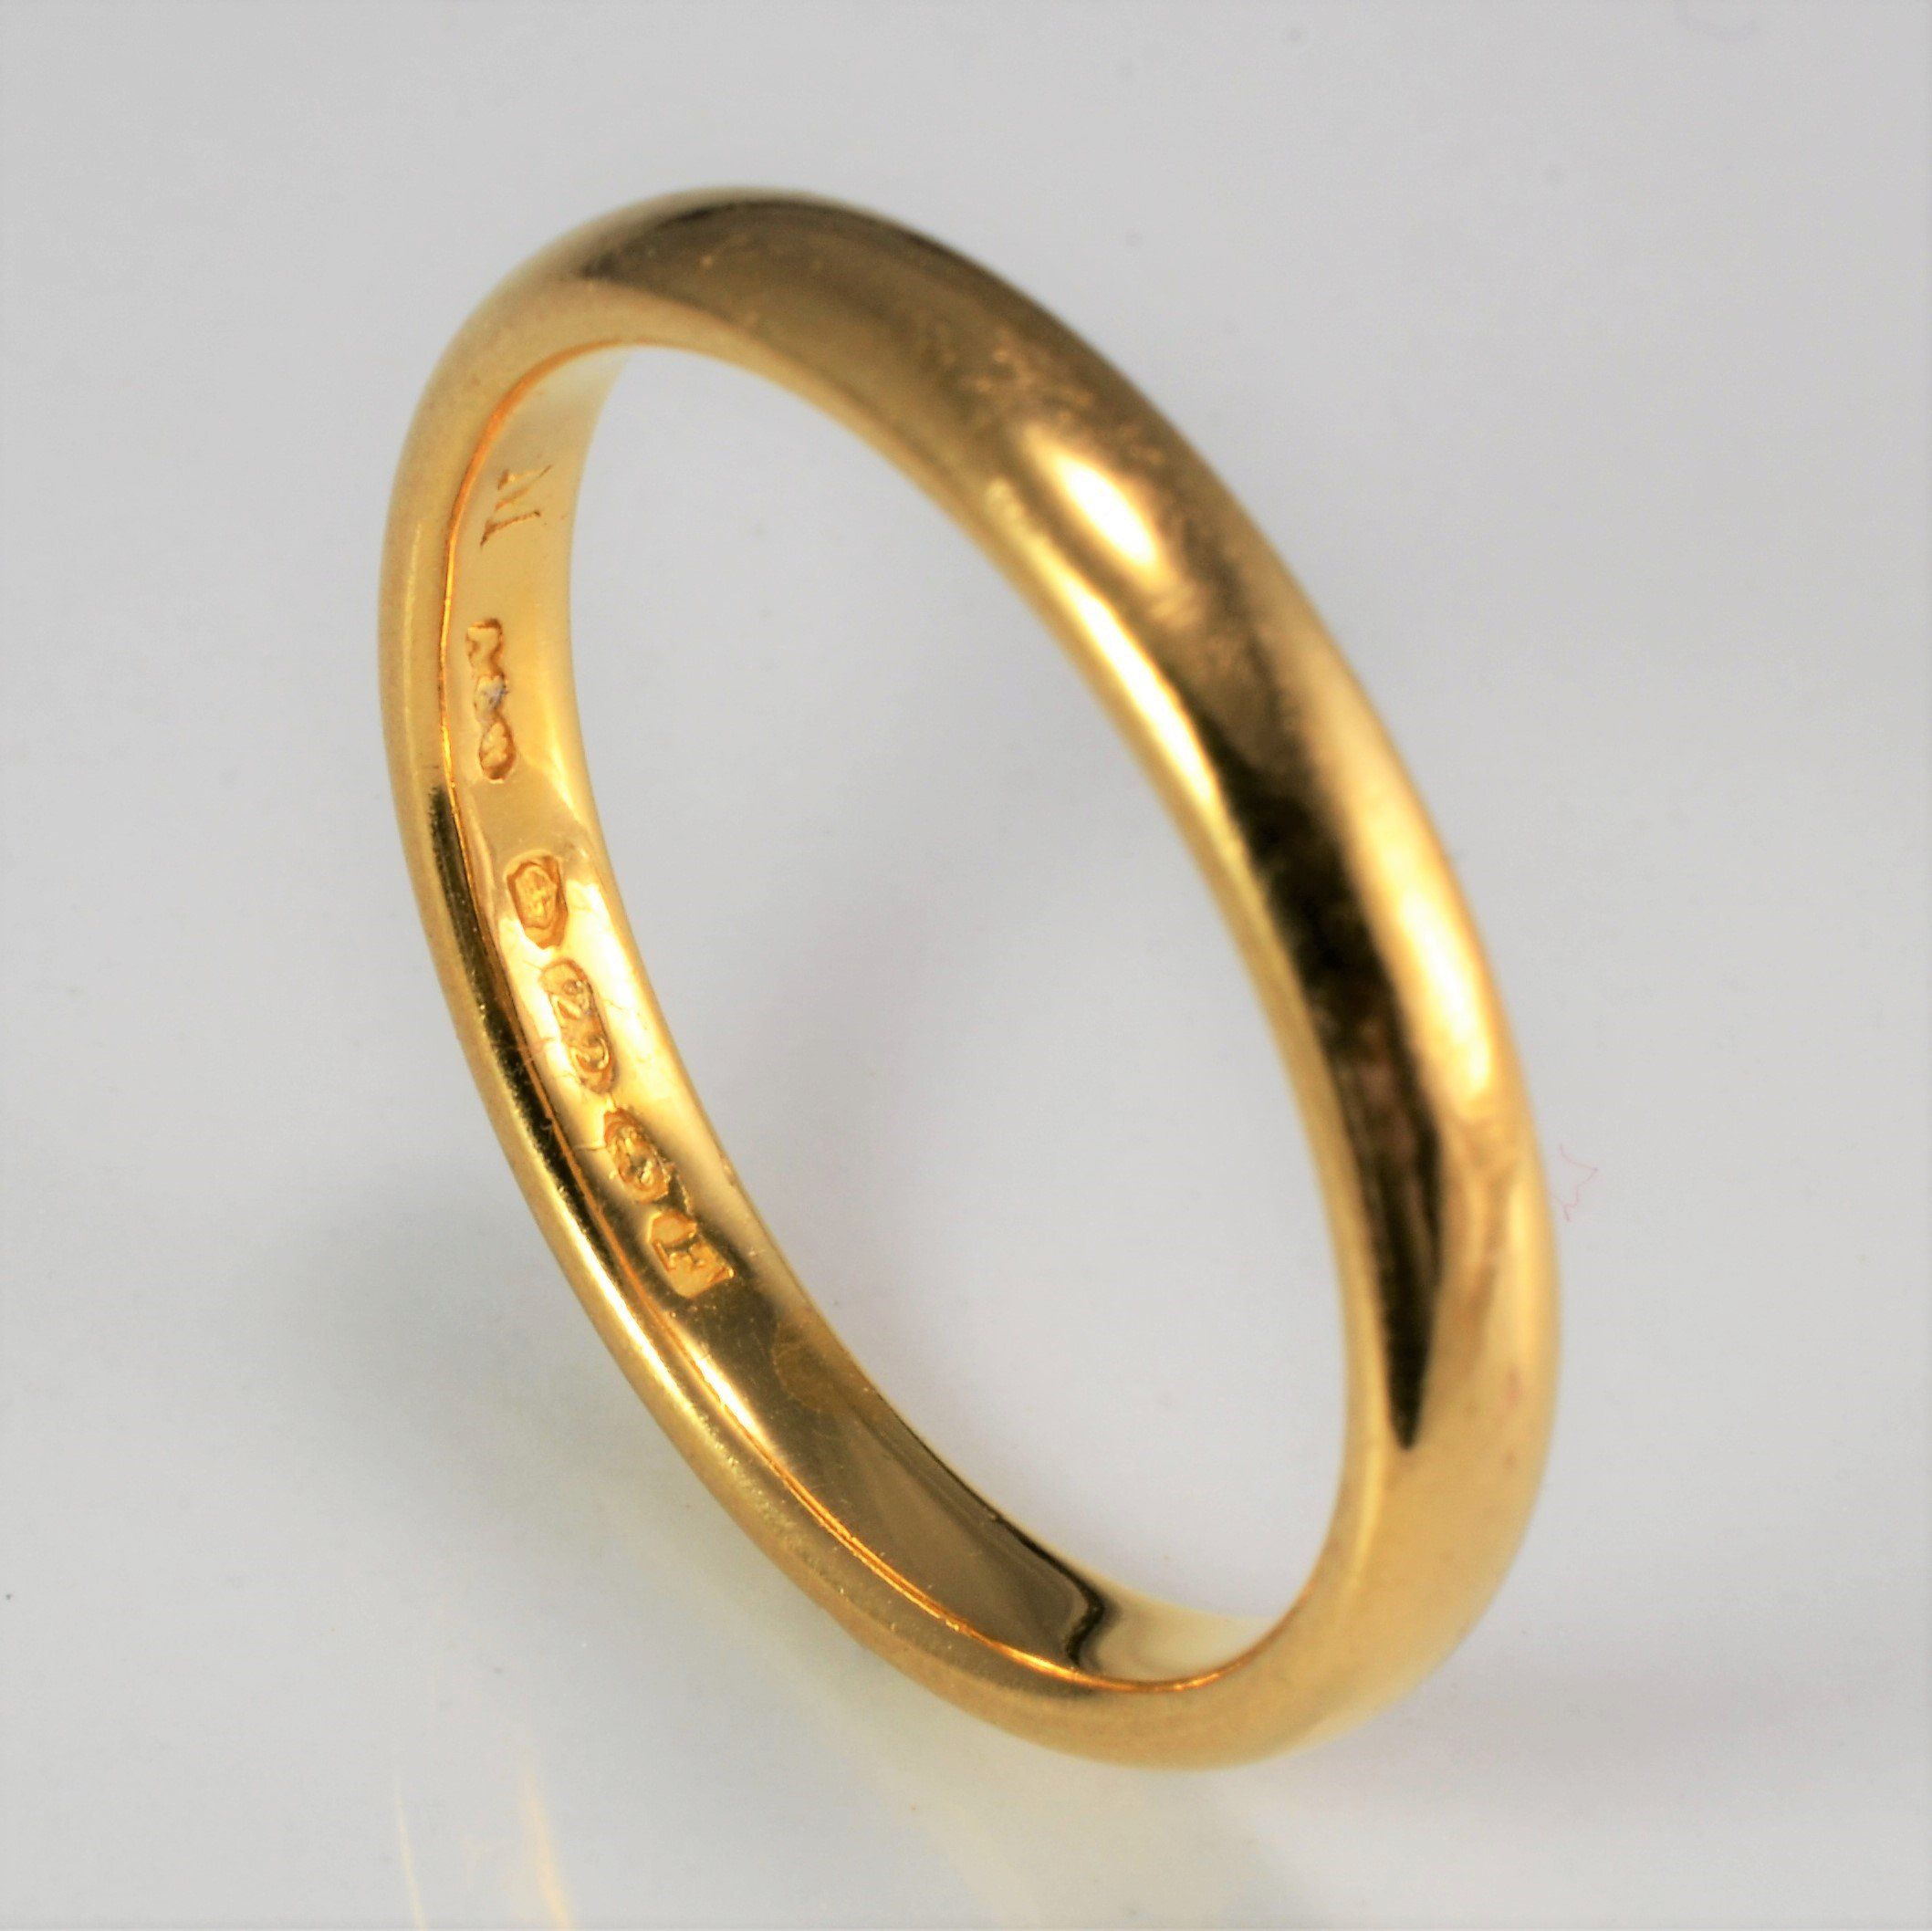 22k Gold Plain Wedding Band Sz 8 In 2020 Plain Wedding Band Plain Gold Wedding Bands Gold Wedding Band